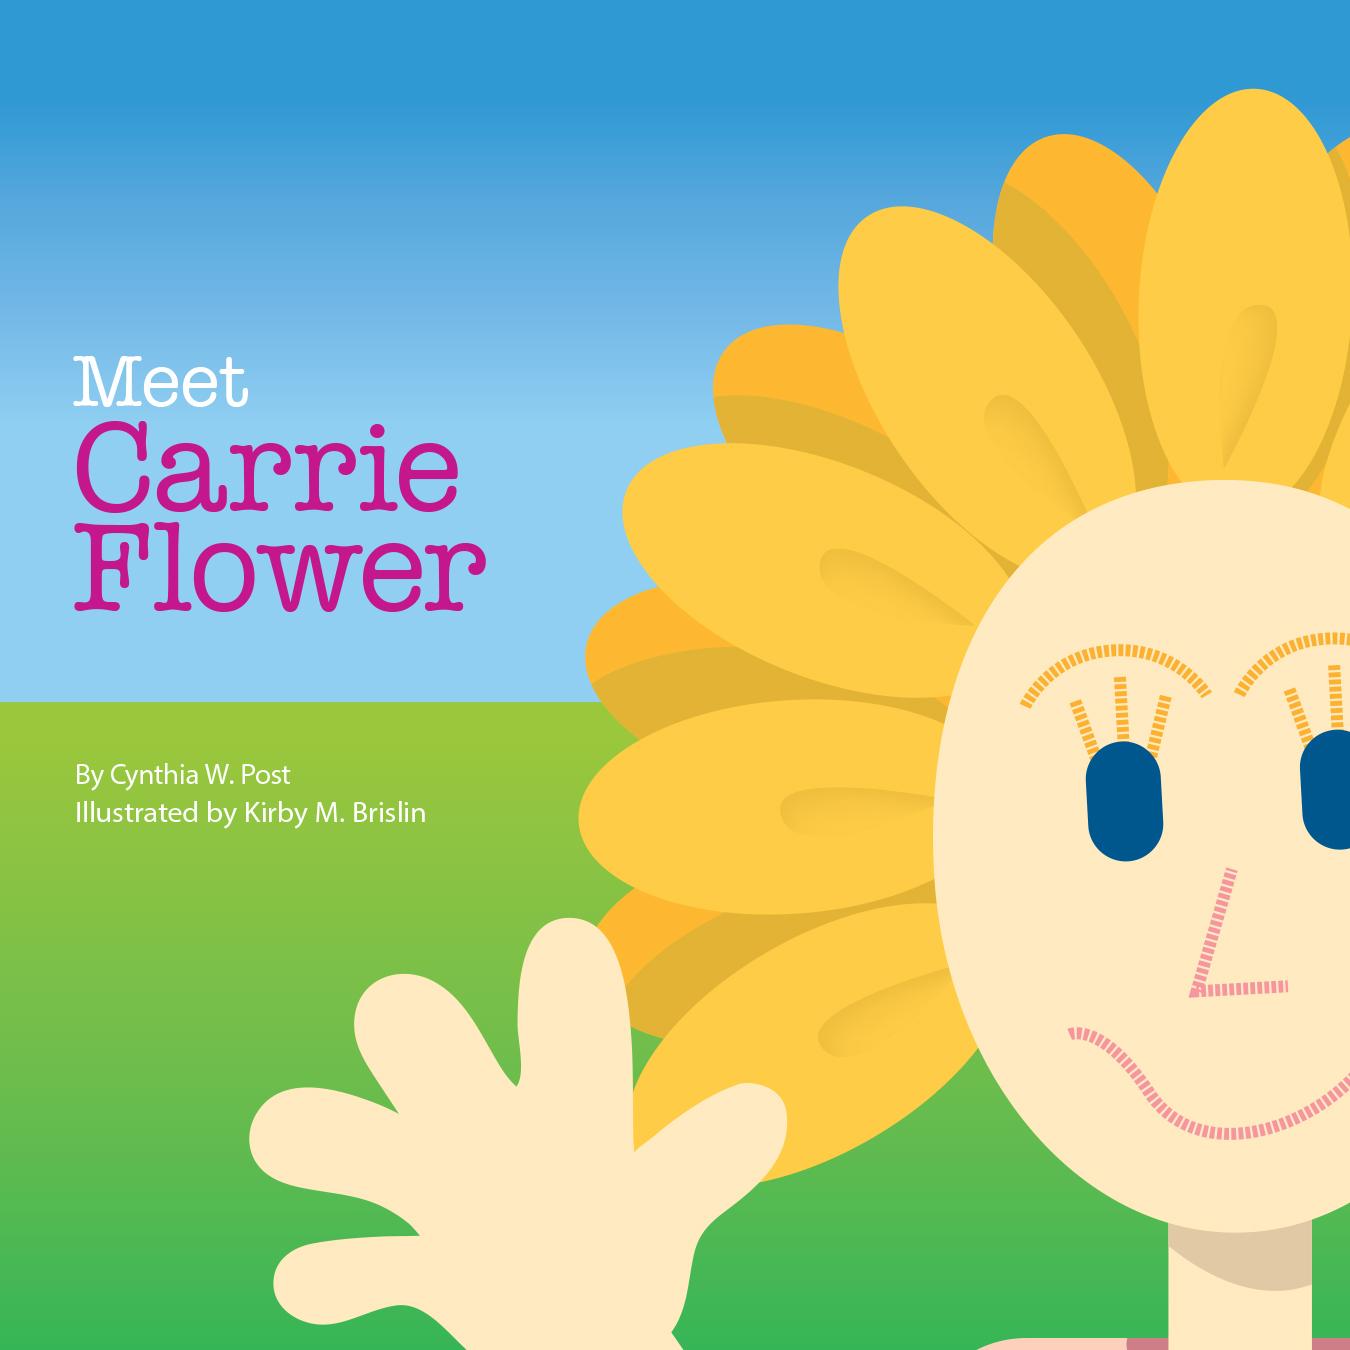 Meet Carrie Flower Web Sample-1.jpg